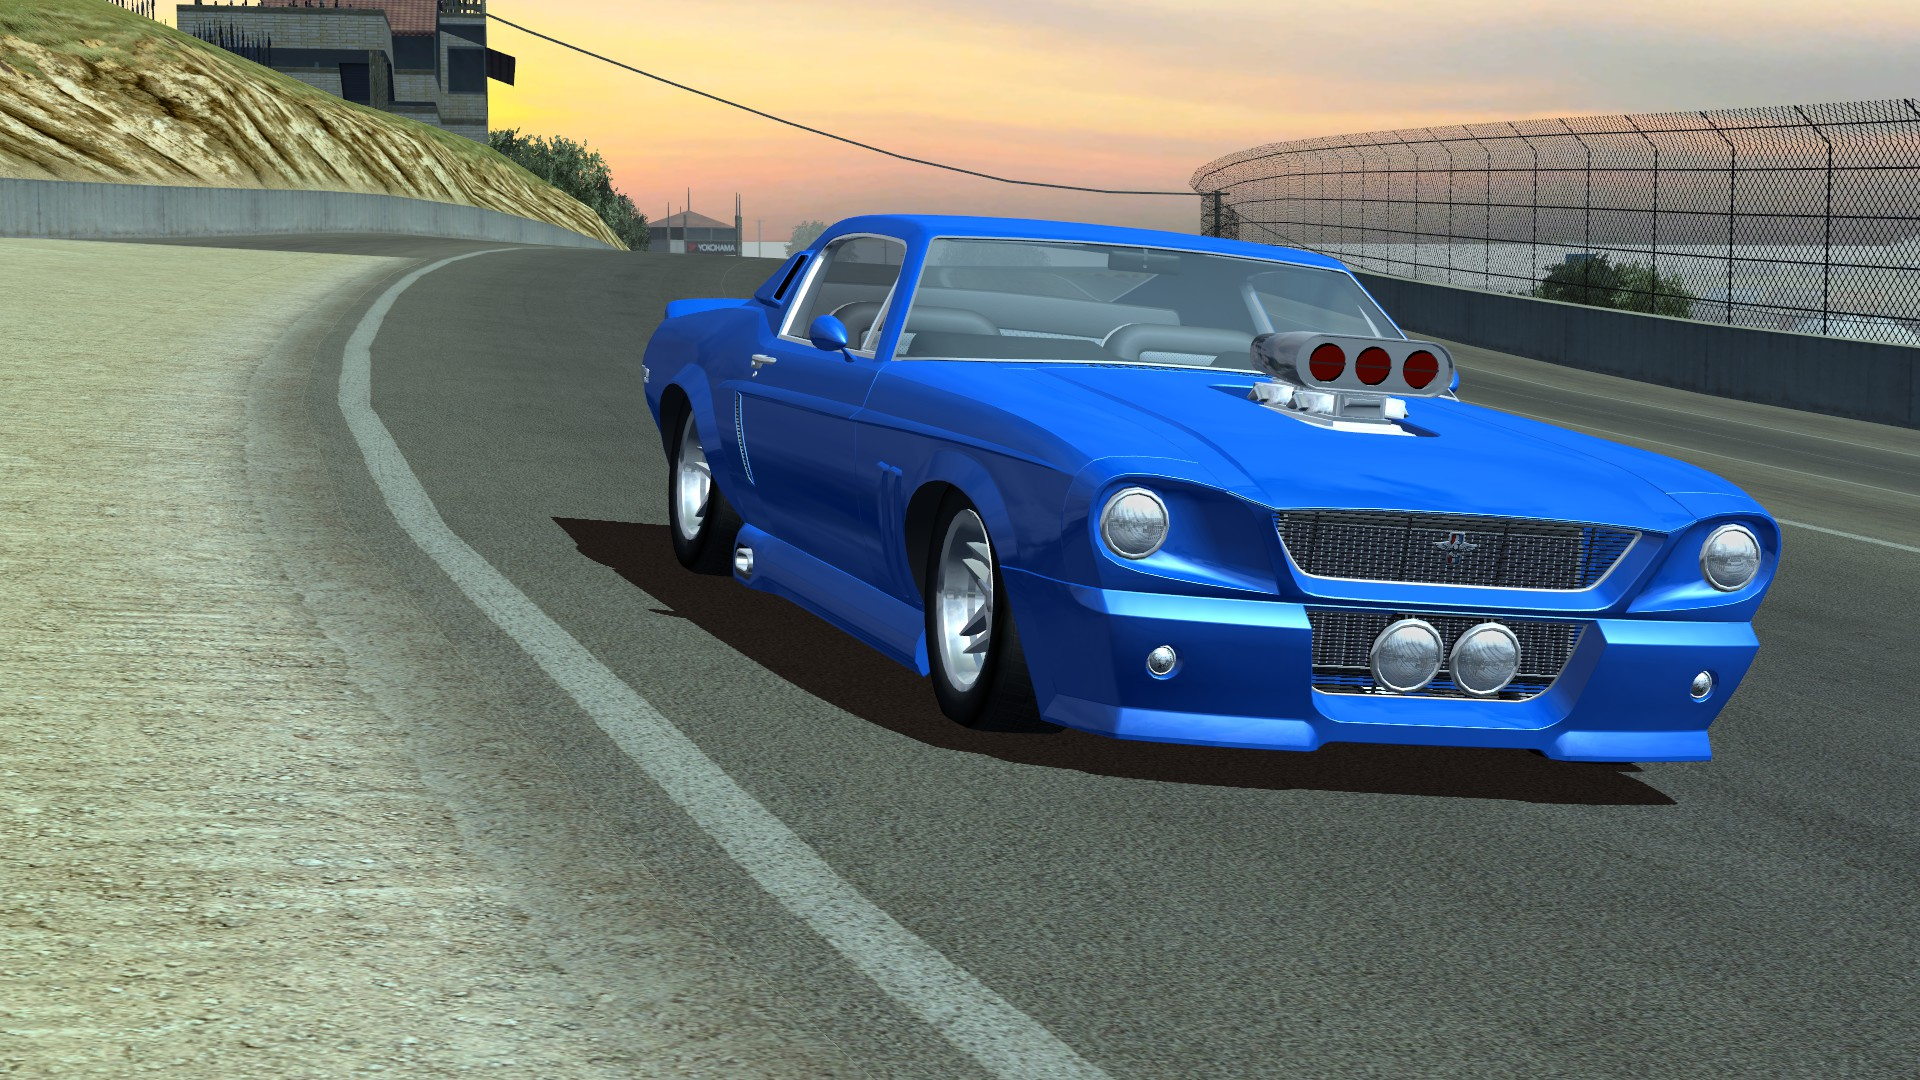 Street Legal Racing: Redline - High Quality Cars Pack